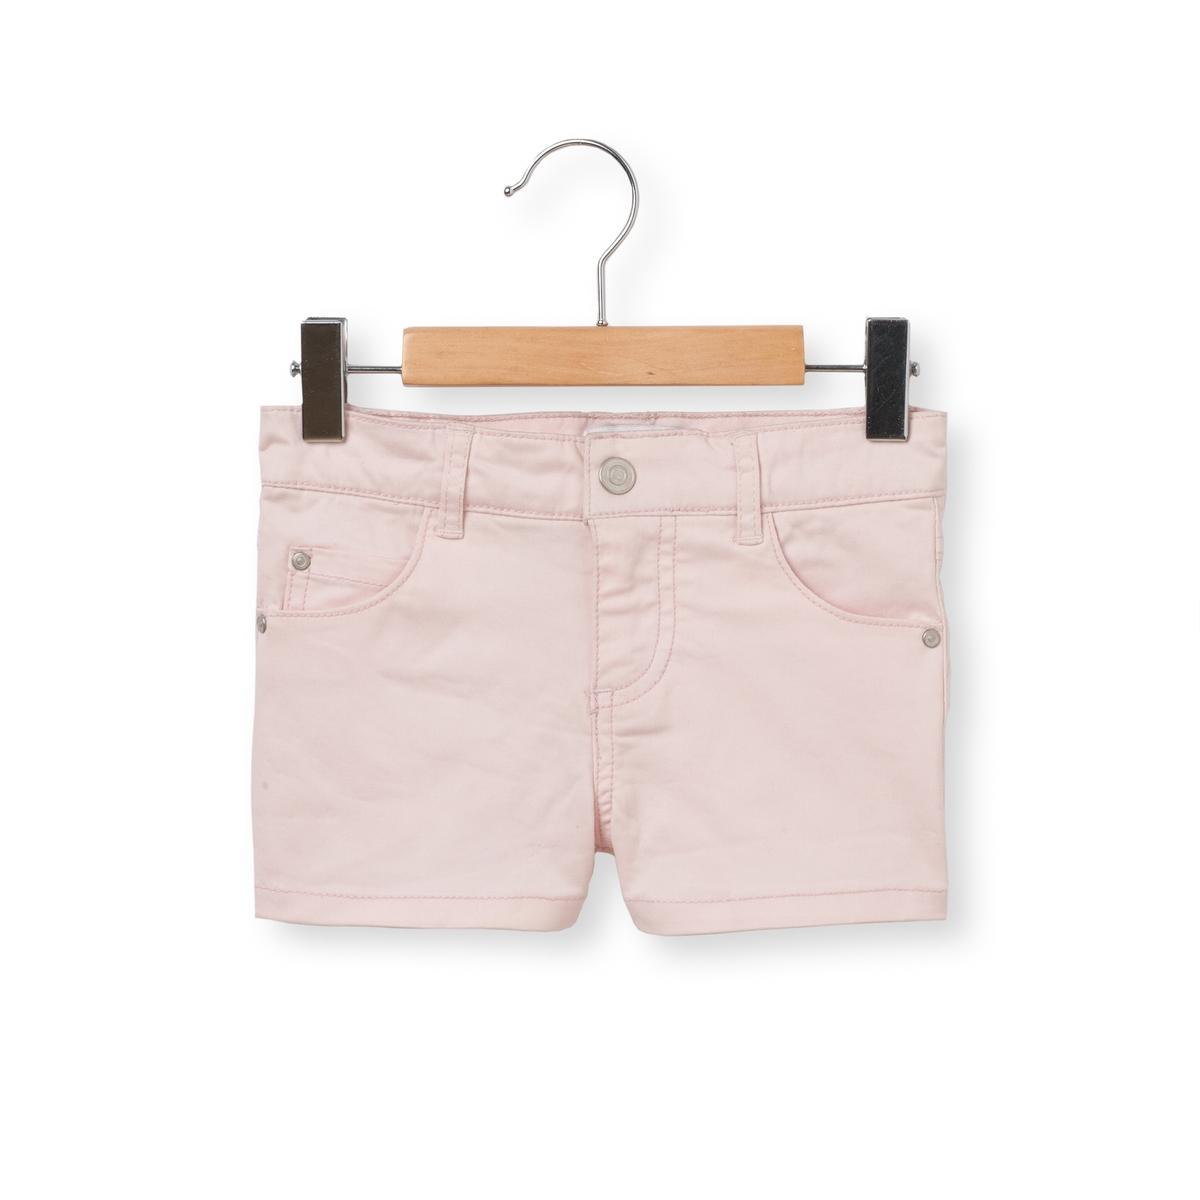 Shorts 5 tasche da 3 a 12 anni